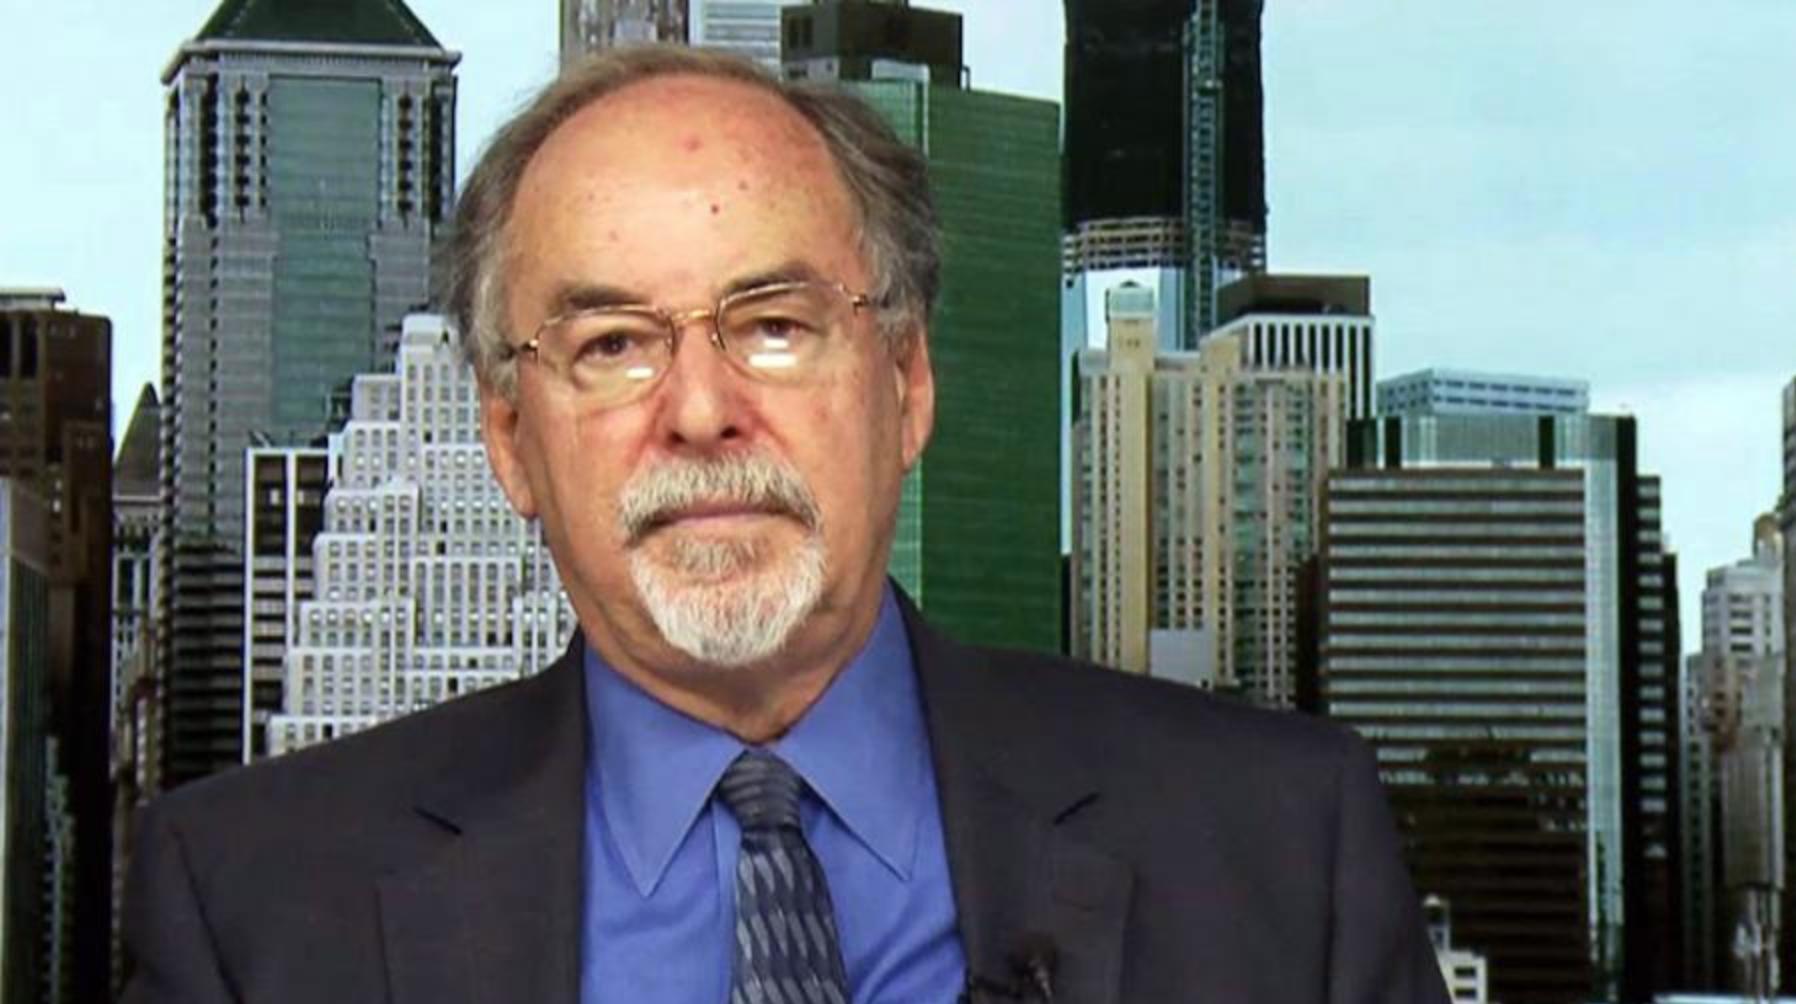 anti-Muslim extremist David Horowitz